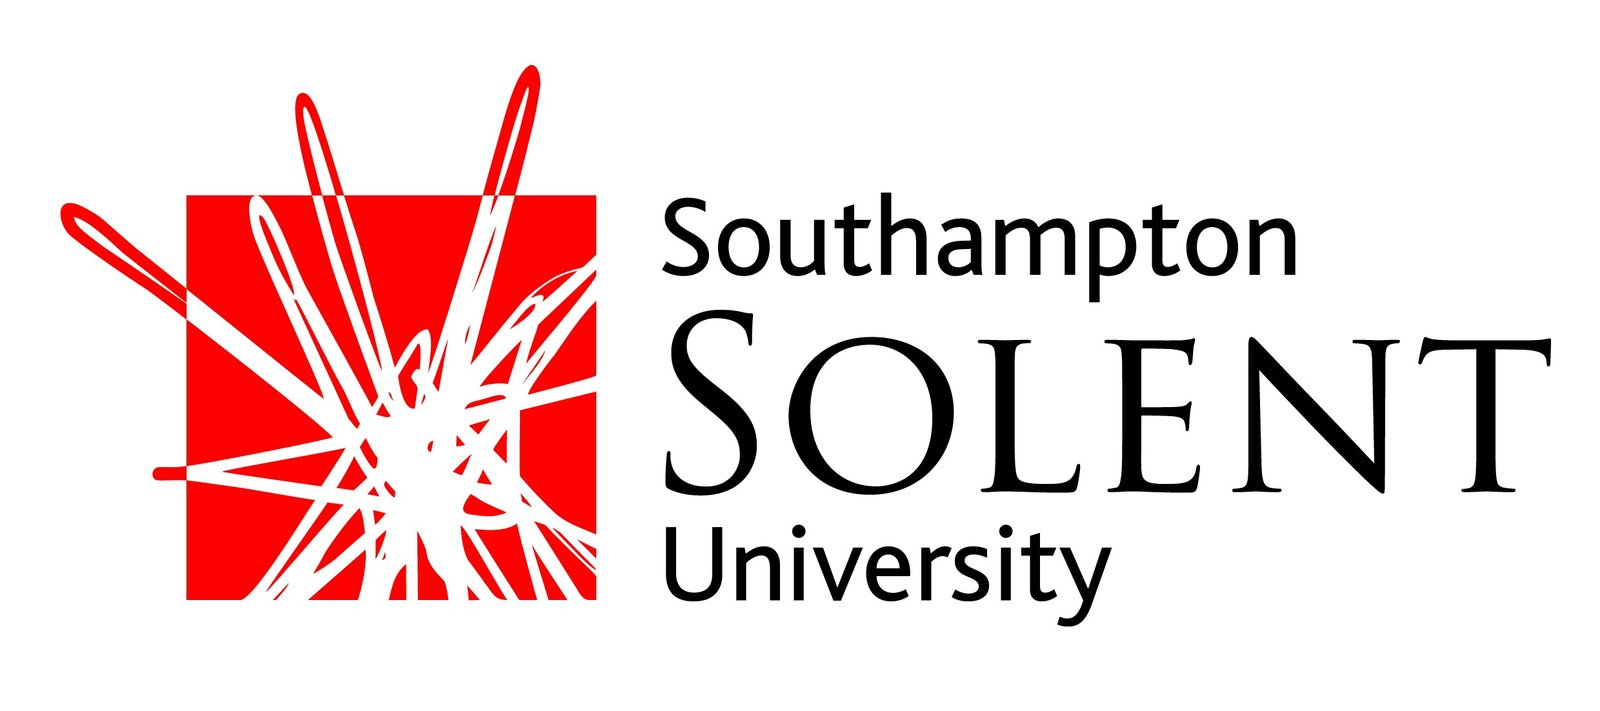 Southampton-Solent-University-logo_1600x